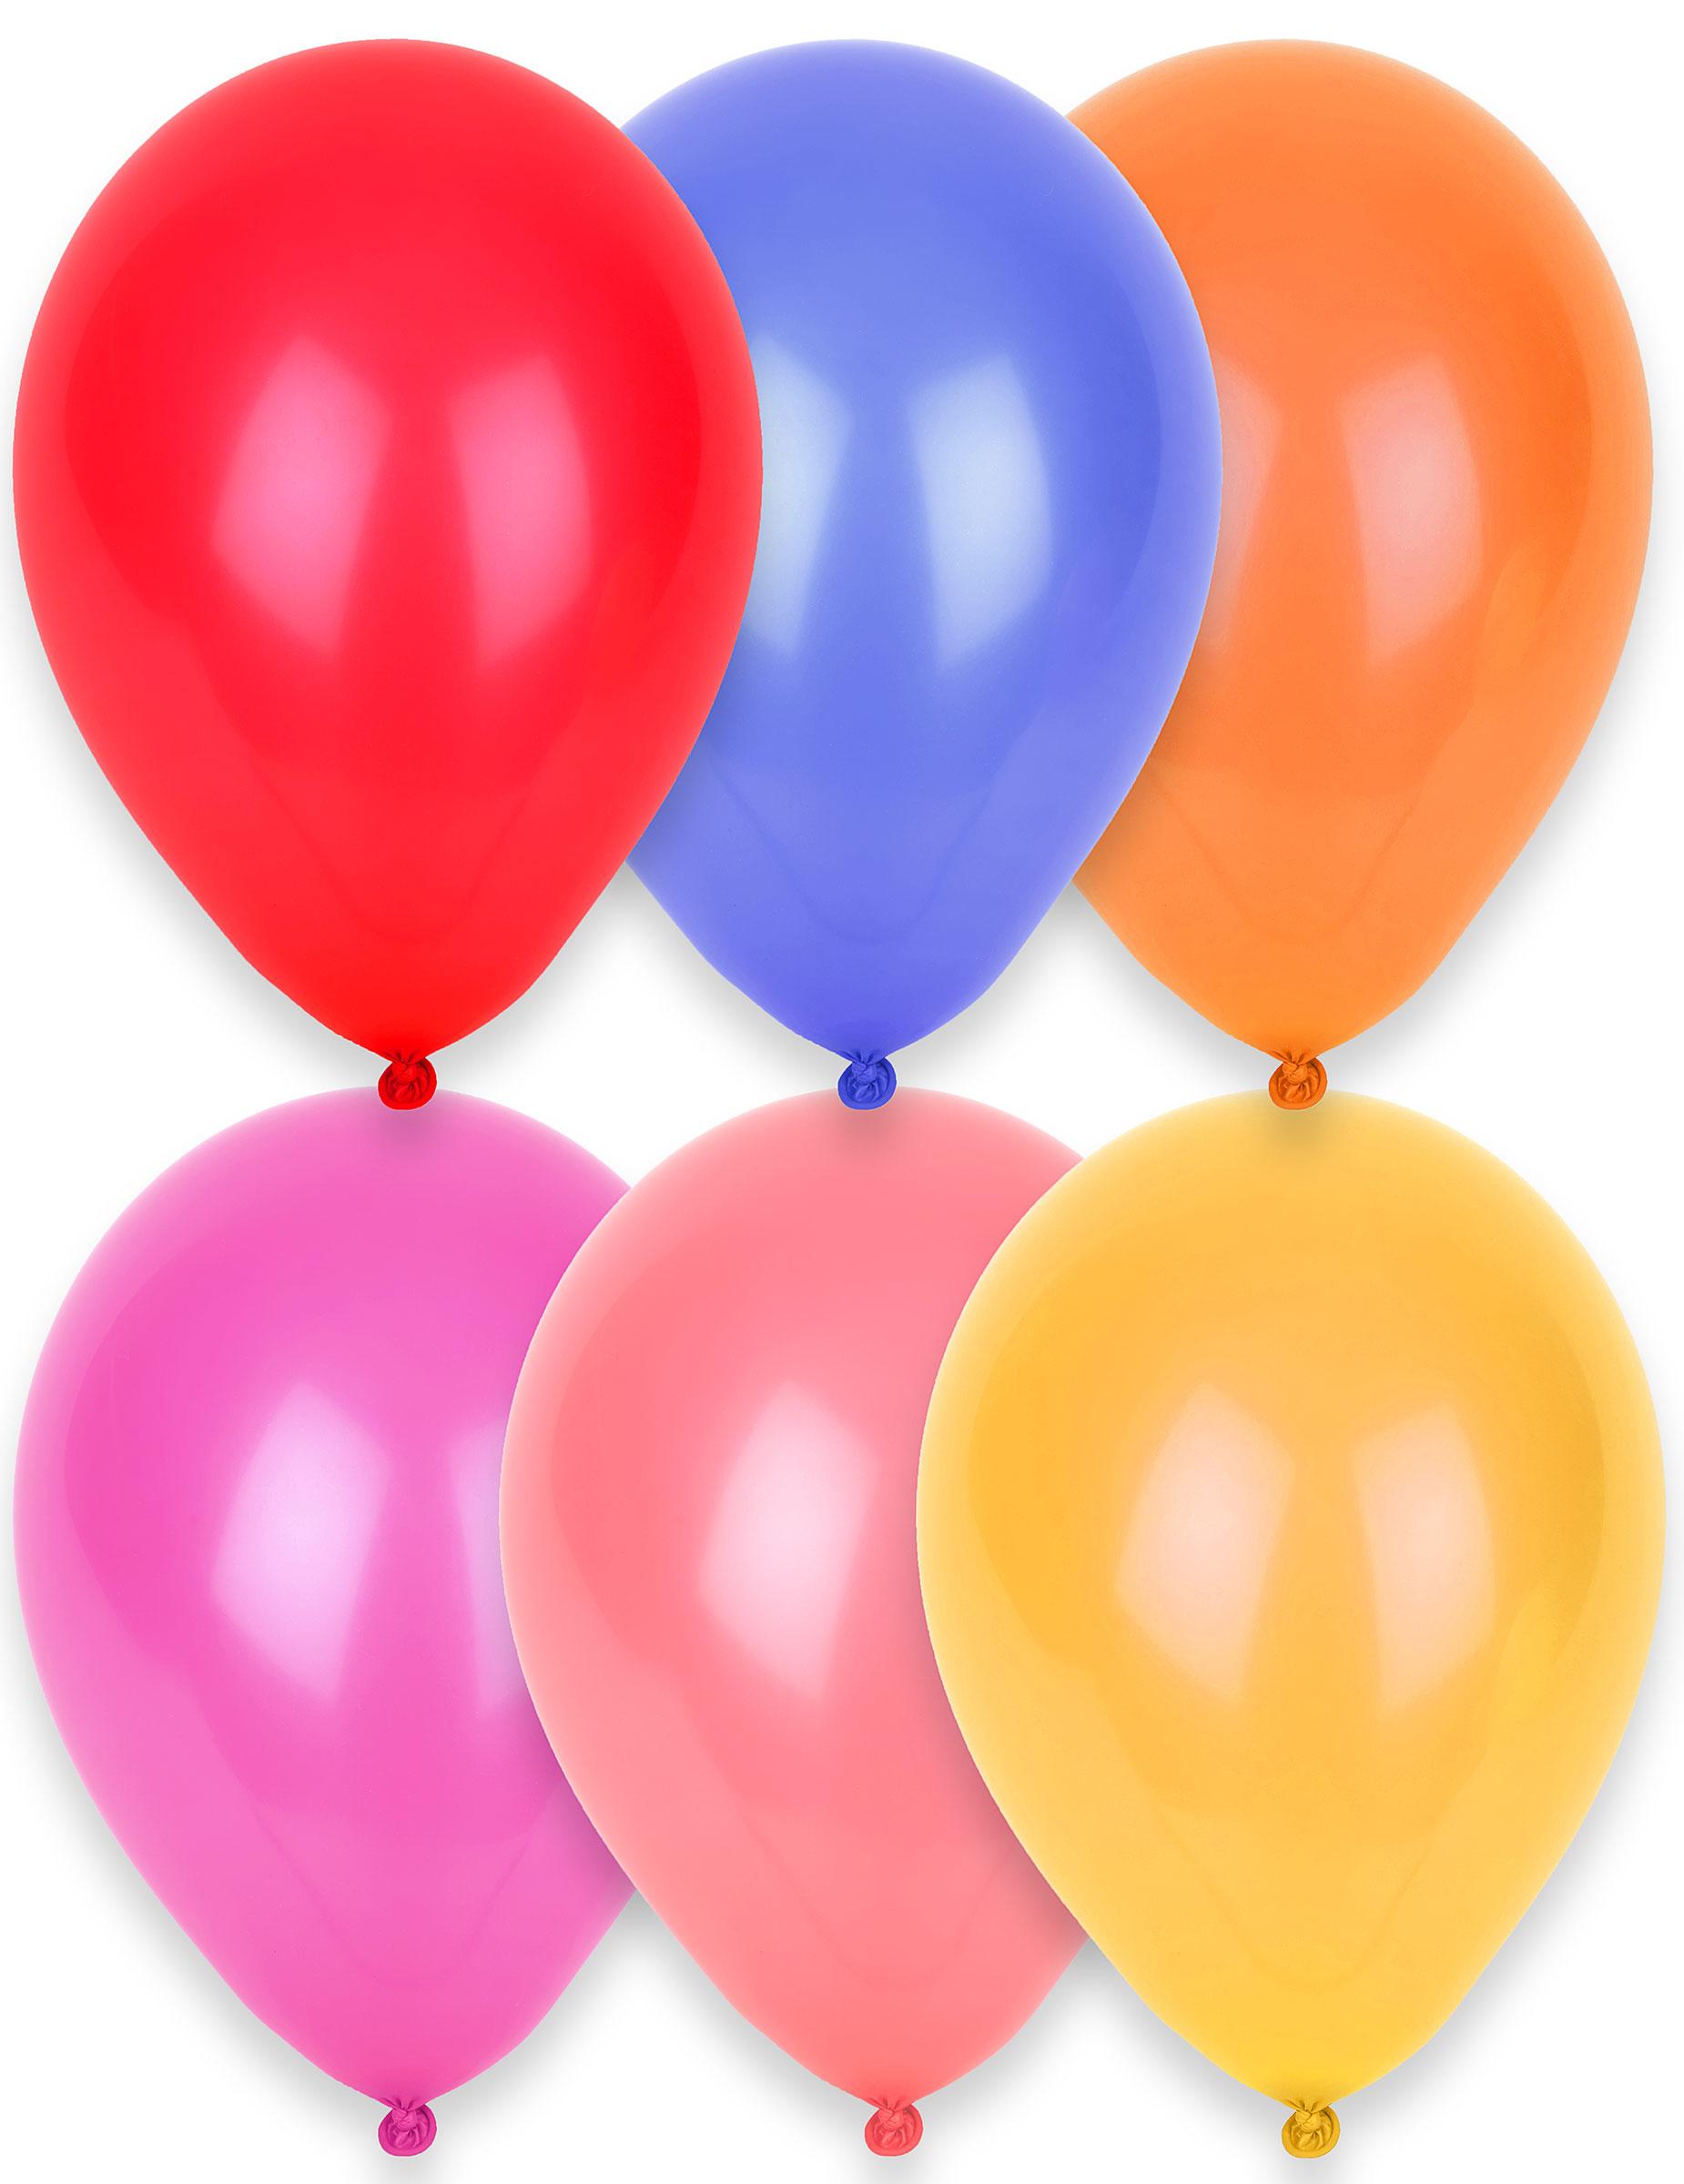 24 globos de diferentes colores 25 cm Decoraciny disfraces